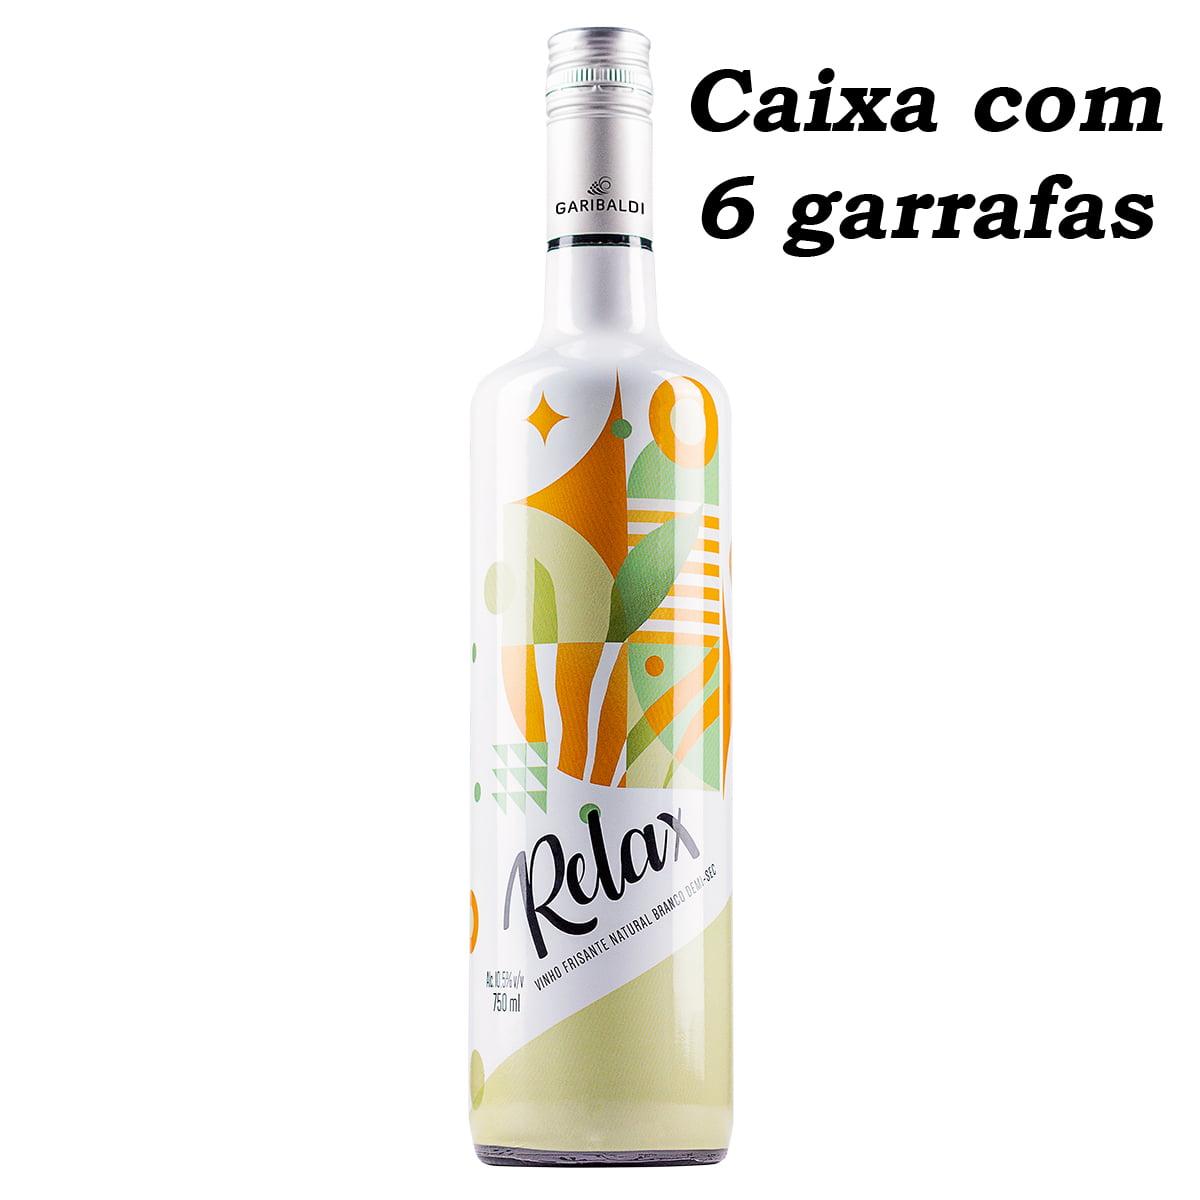 Vinho Garibaldi Relax Frisante Branco Demi-Sec 750ml C/6